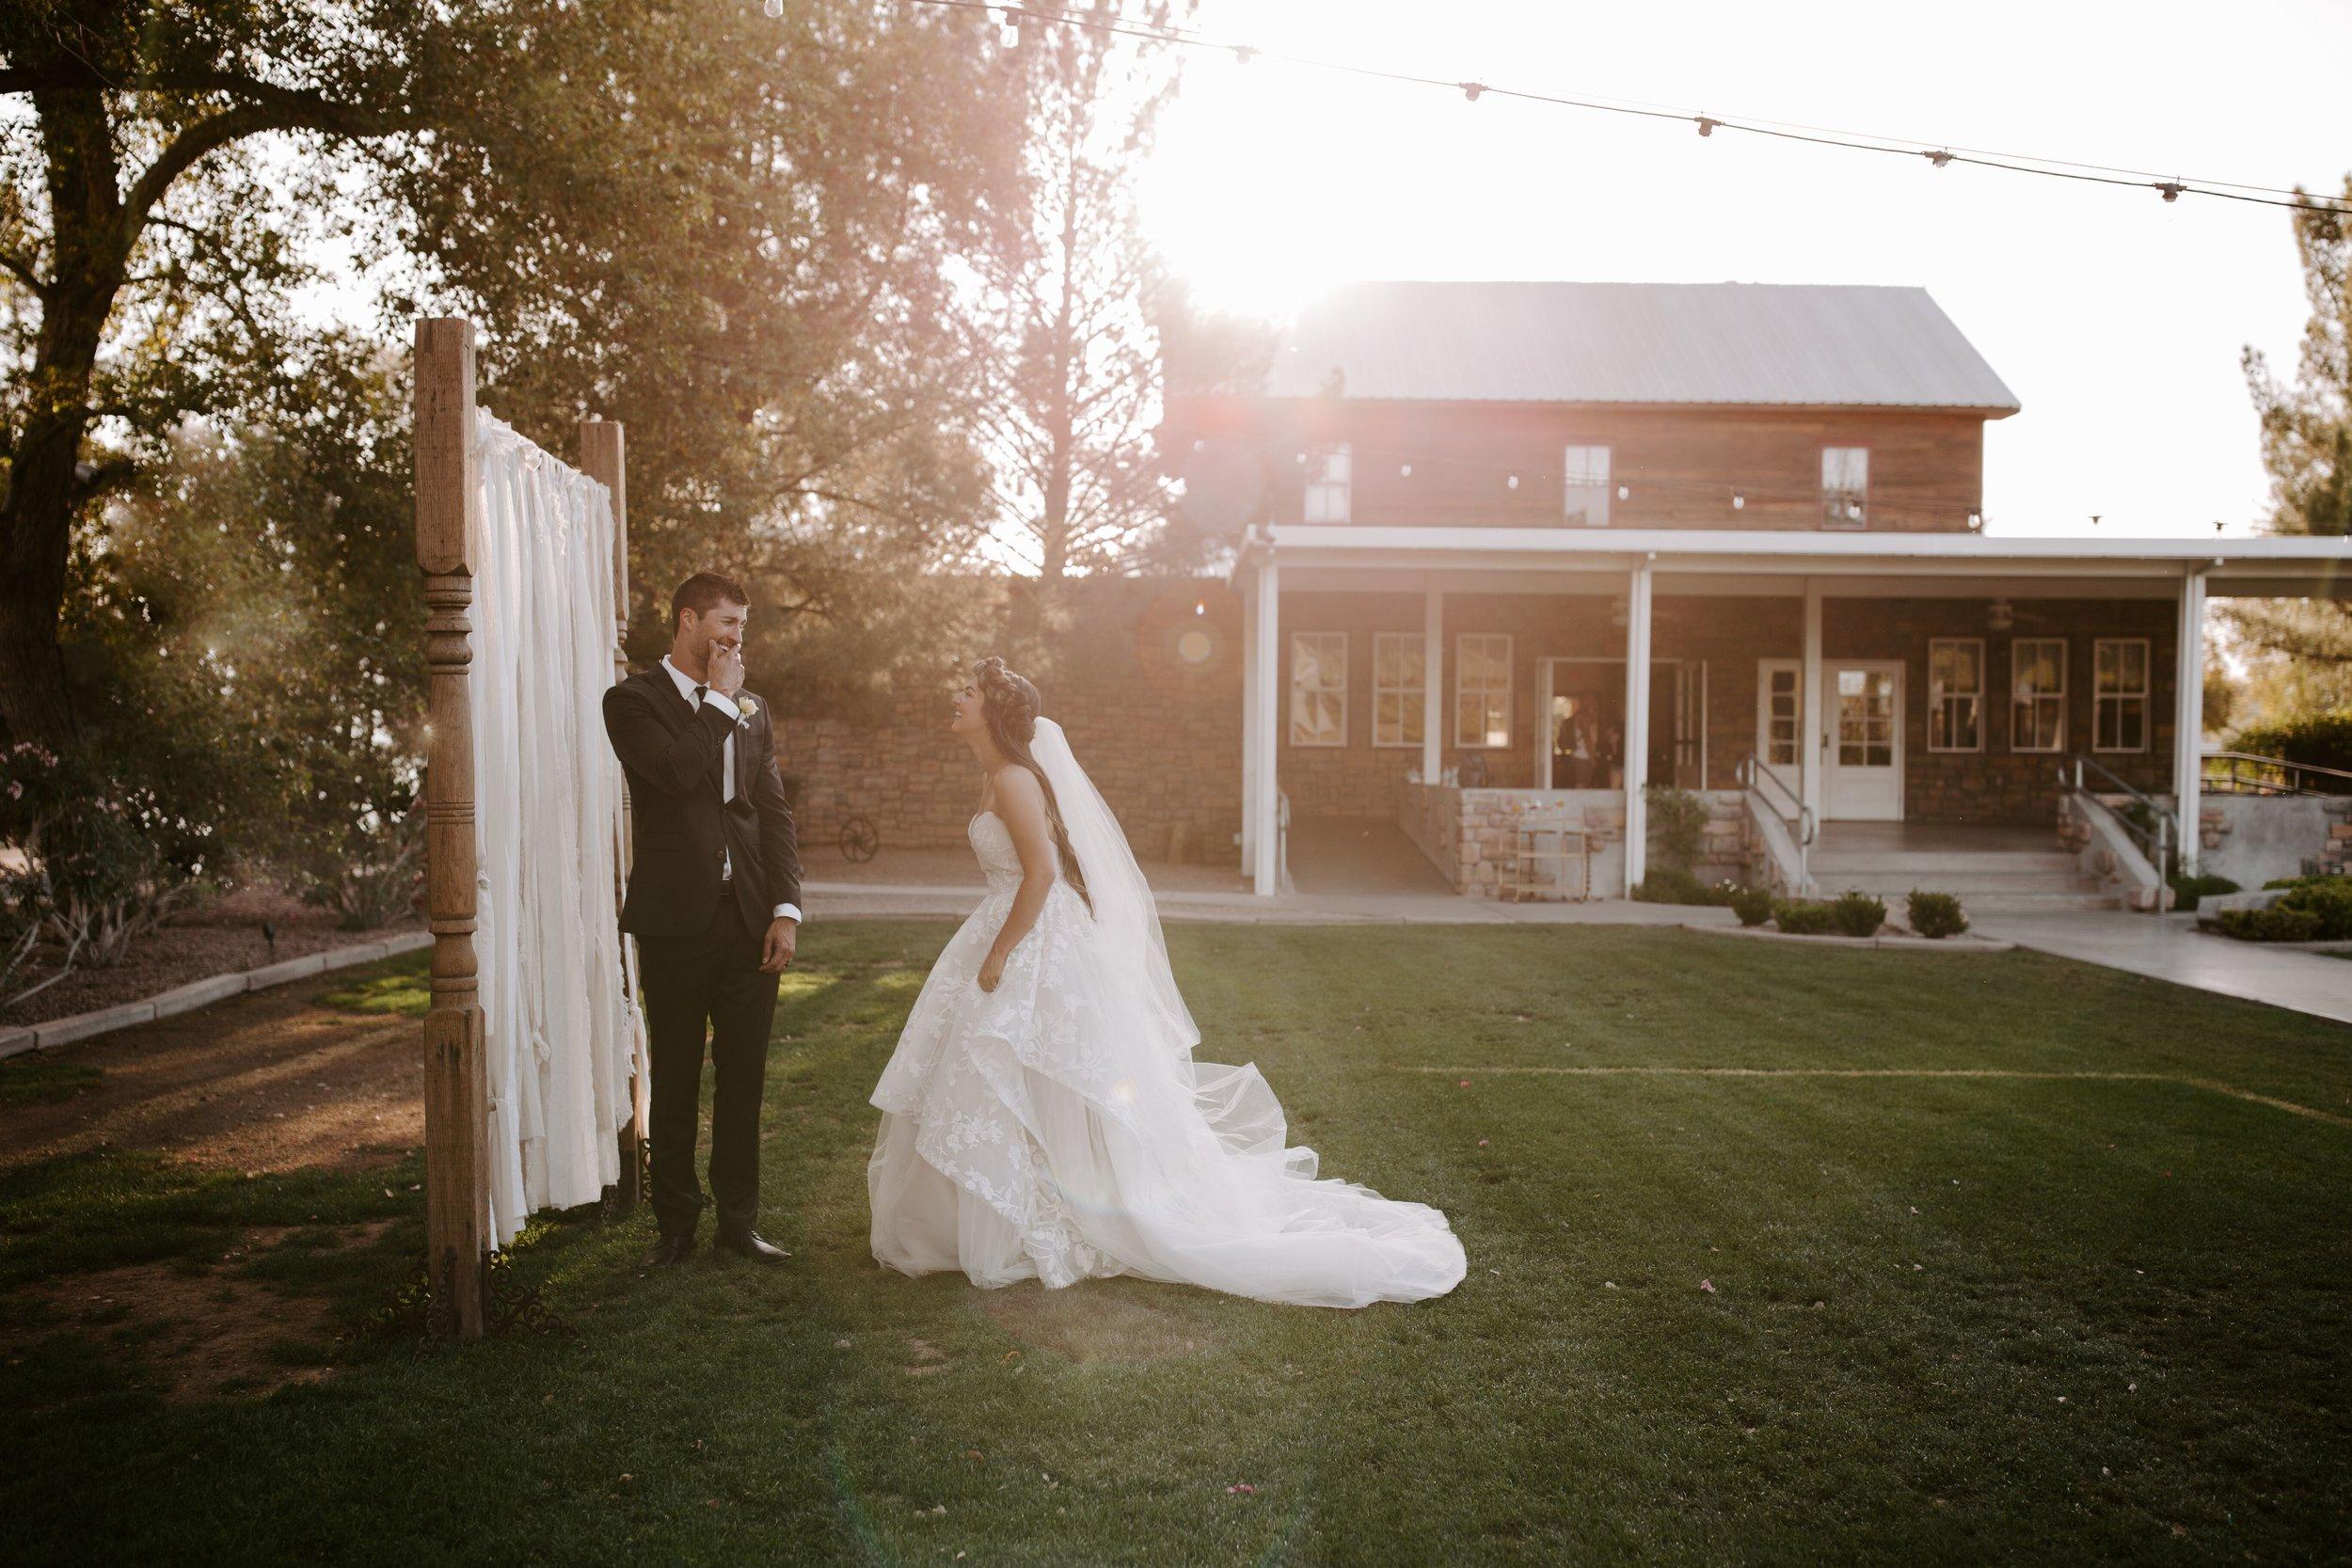 BrideBeforeReveal